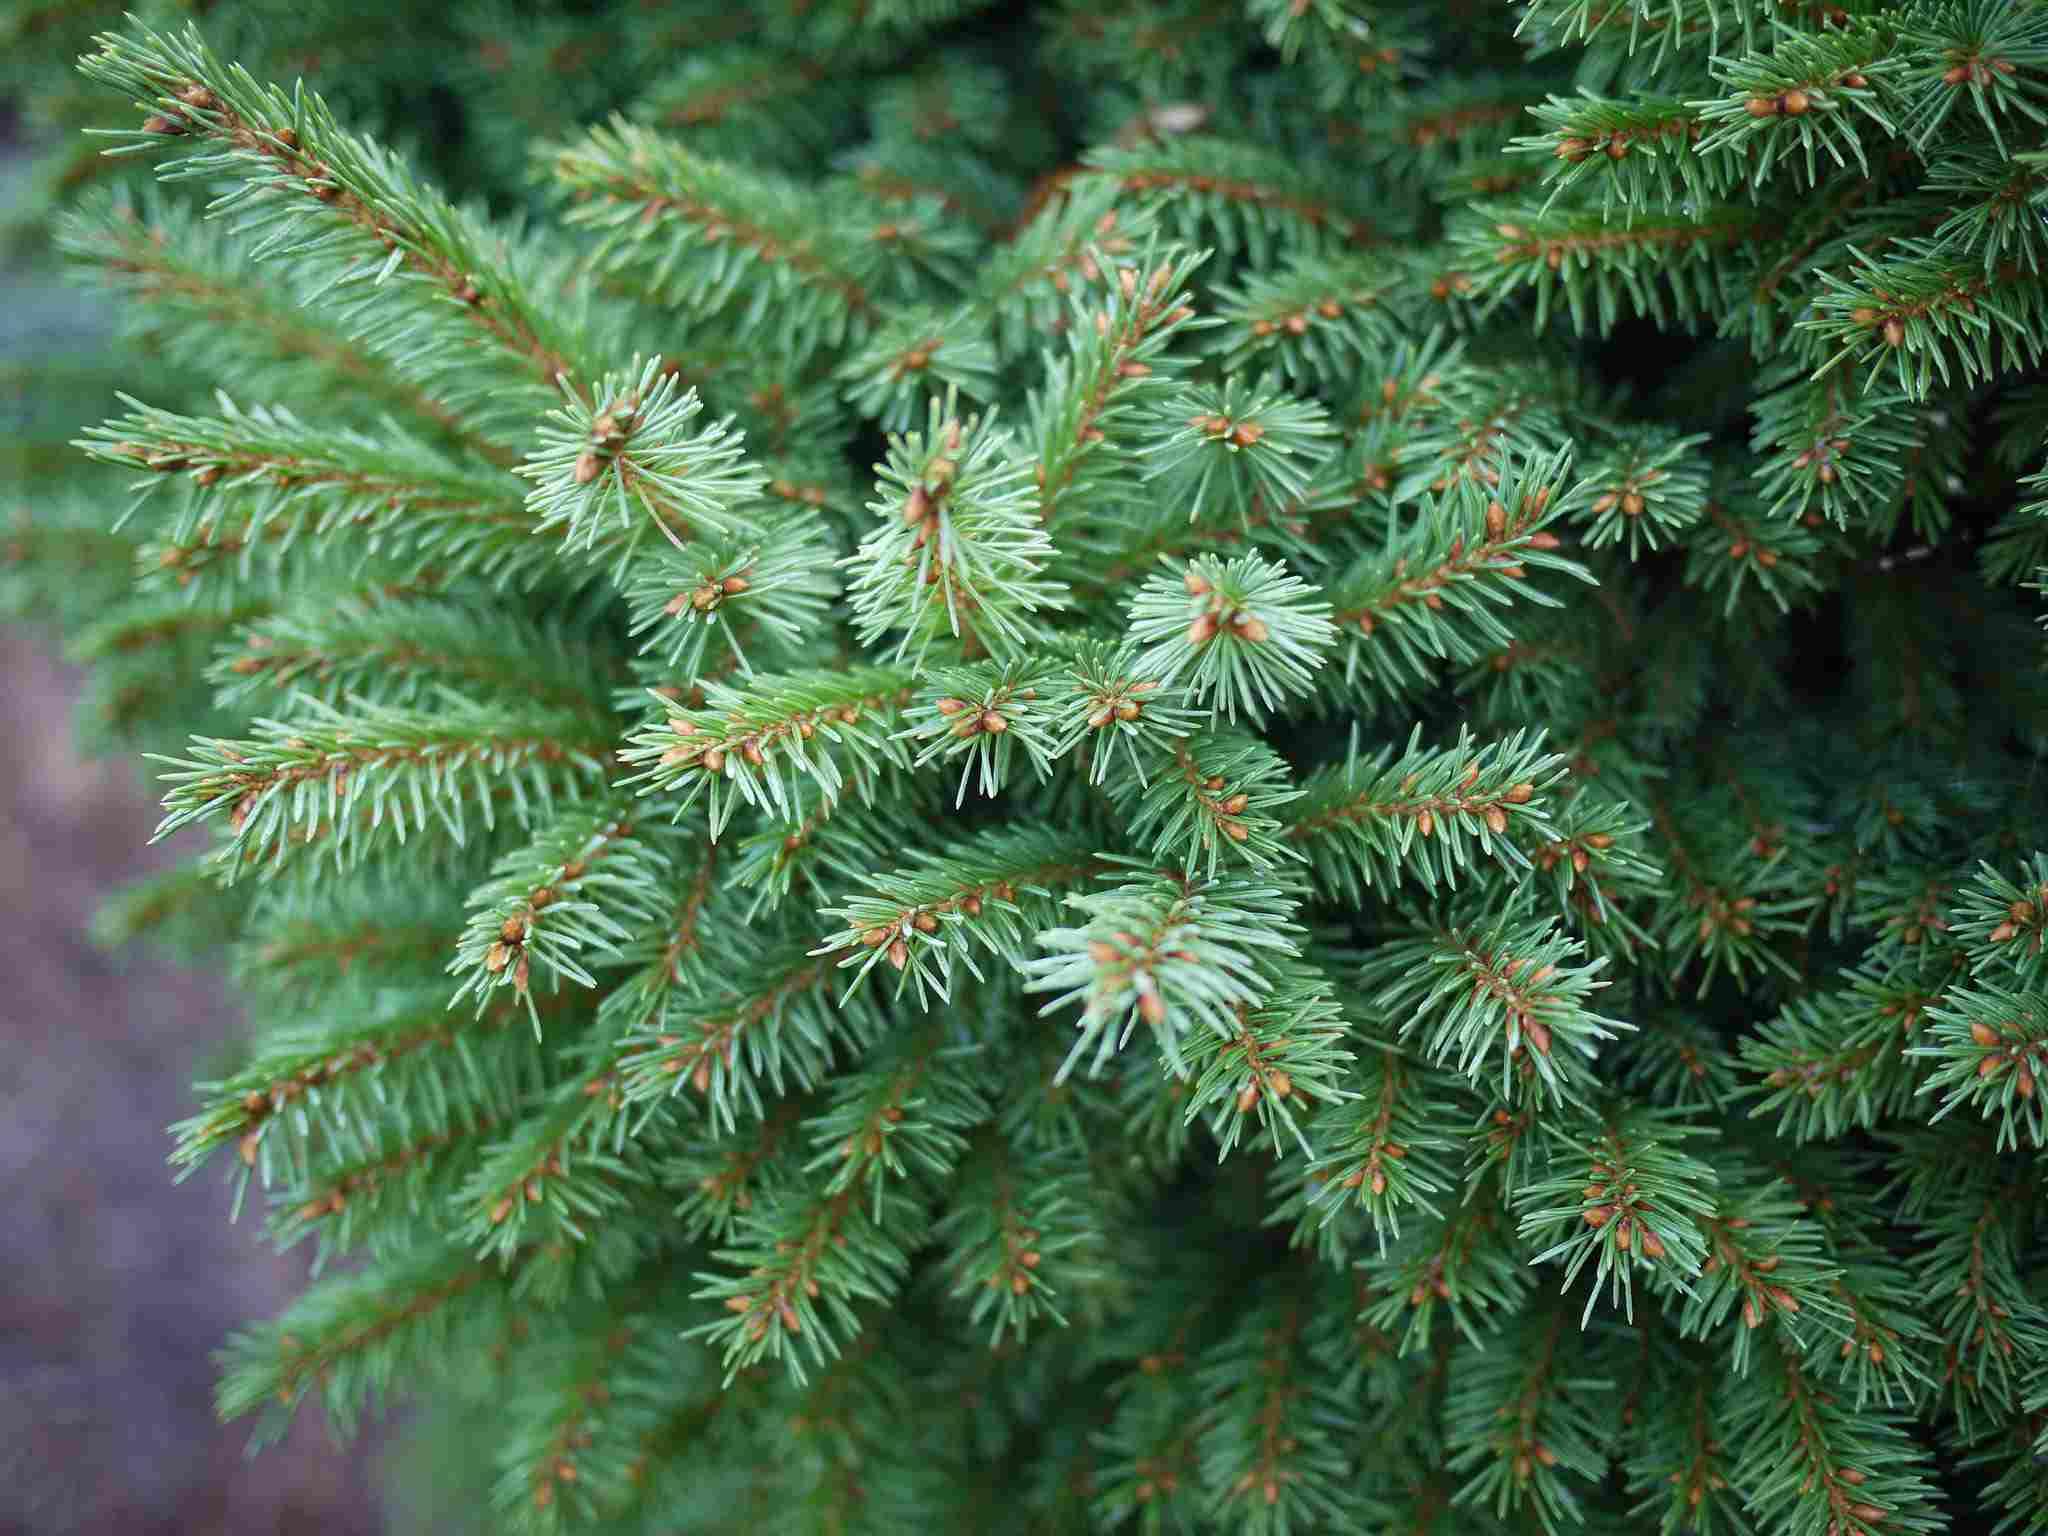 Dwarf Spruce